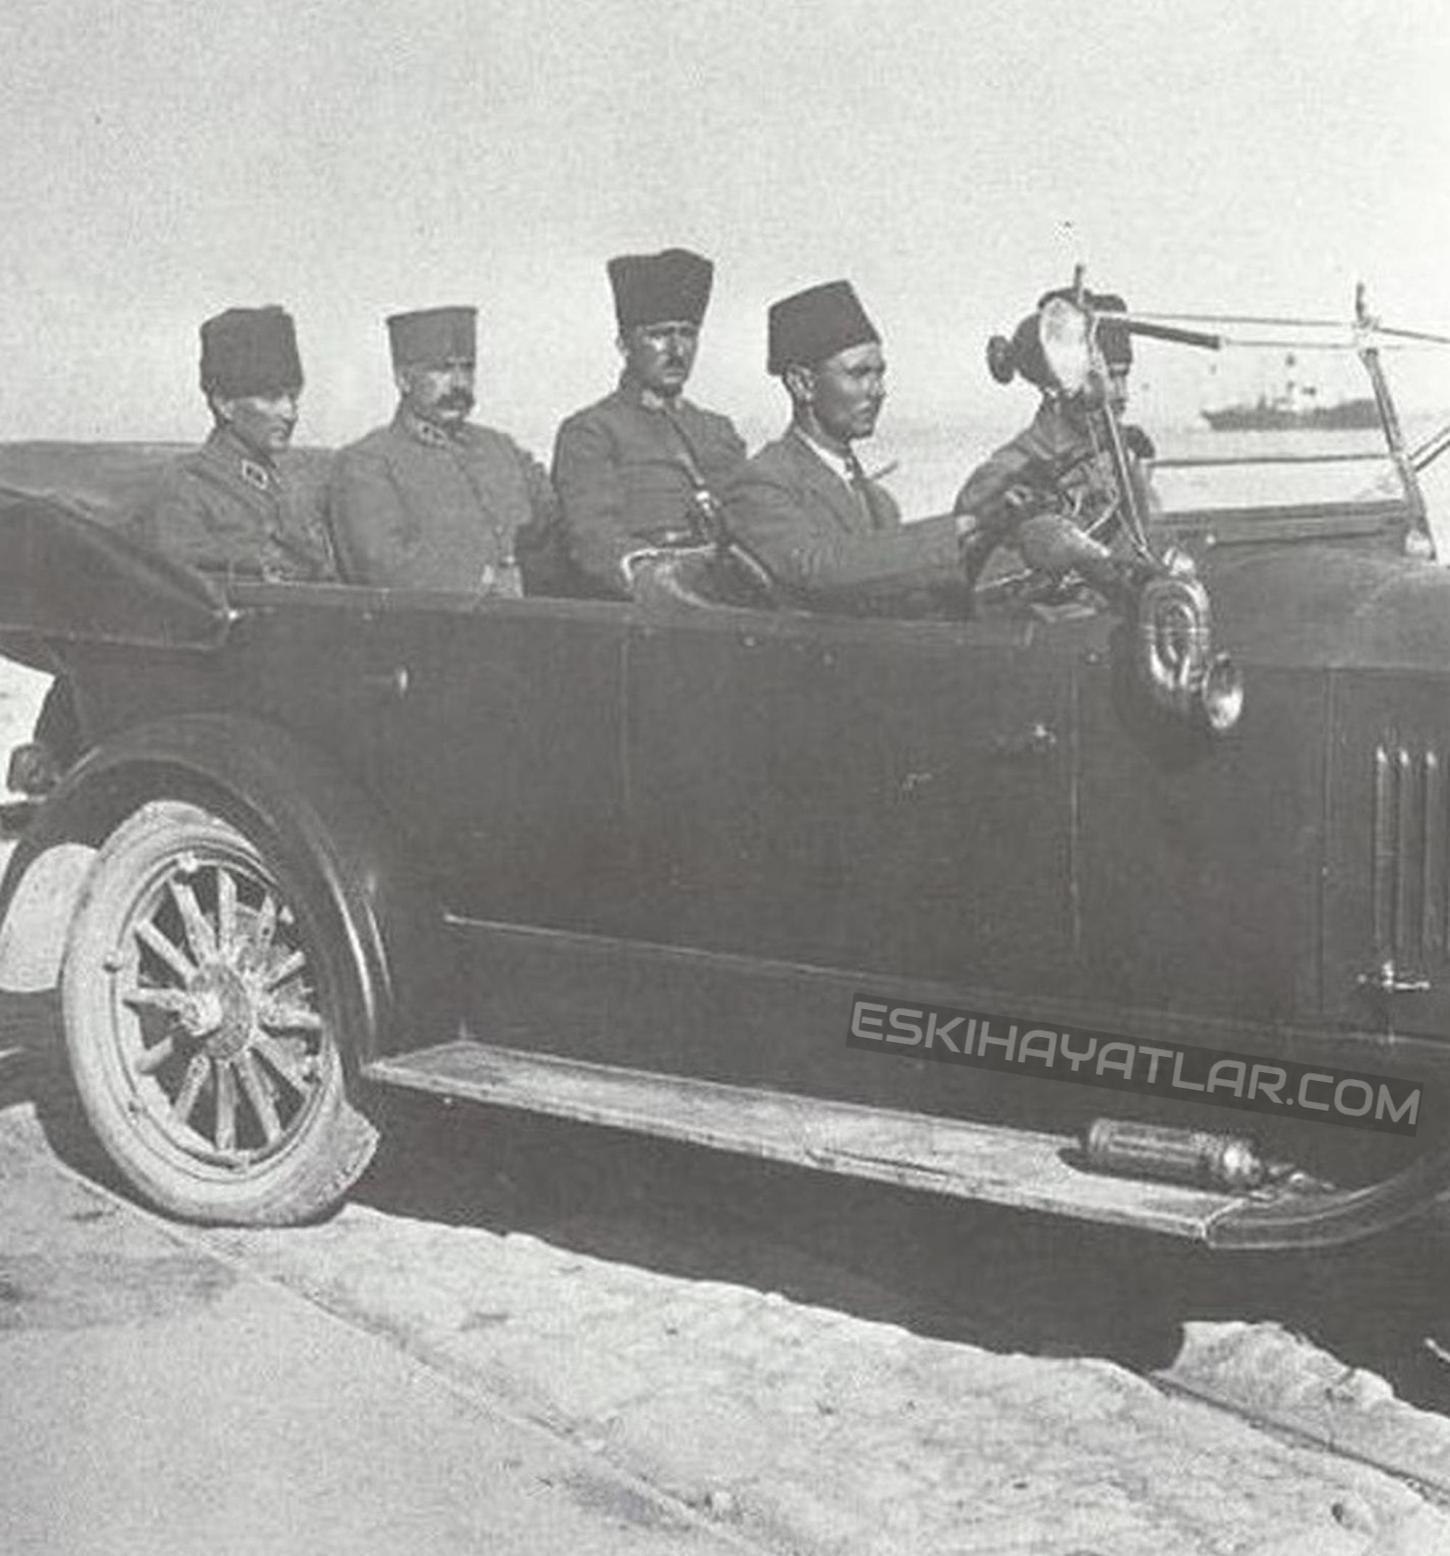 ataturk-izmir-gunleri-mustafa-kemal-pasa-1922-izmir-fotograflari (1)